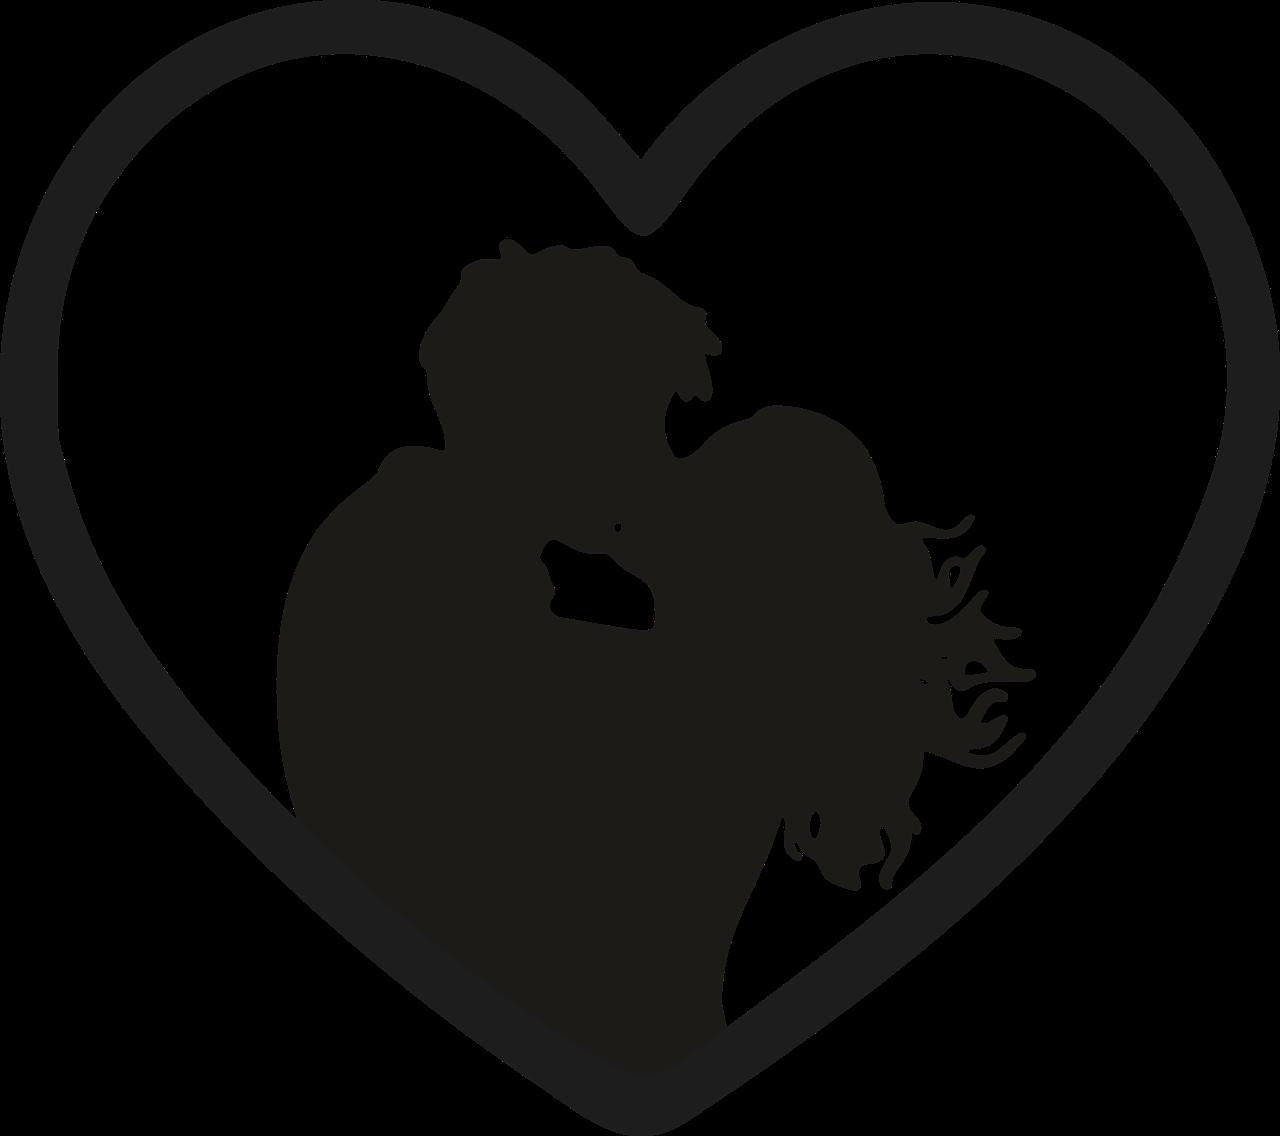 Картинки сердца целуются